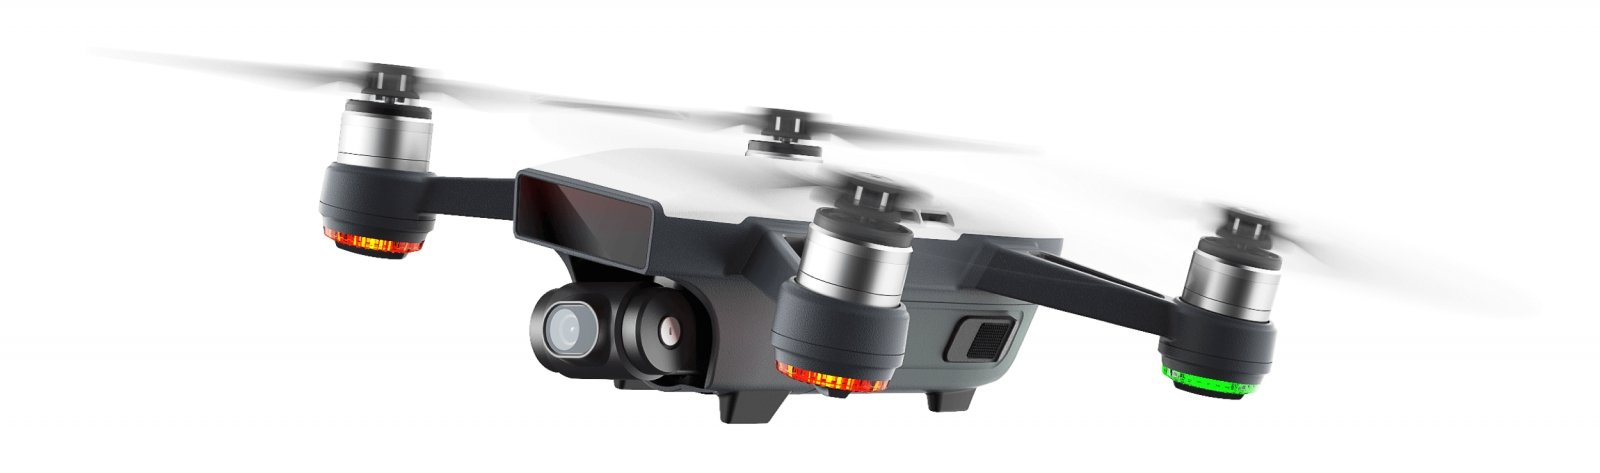 Квадрокоптер с камерой для охоты видео куплю очки vr dji goggles в бийск